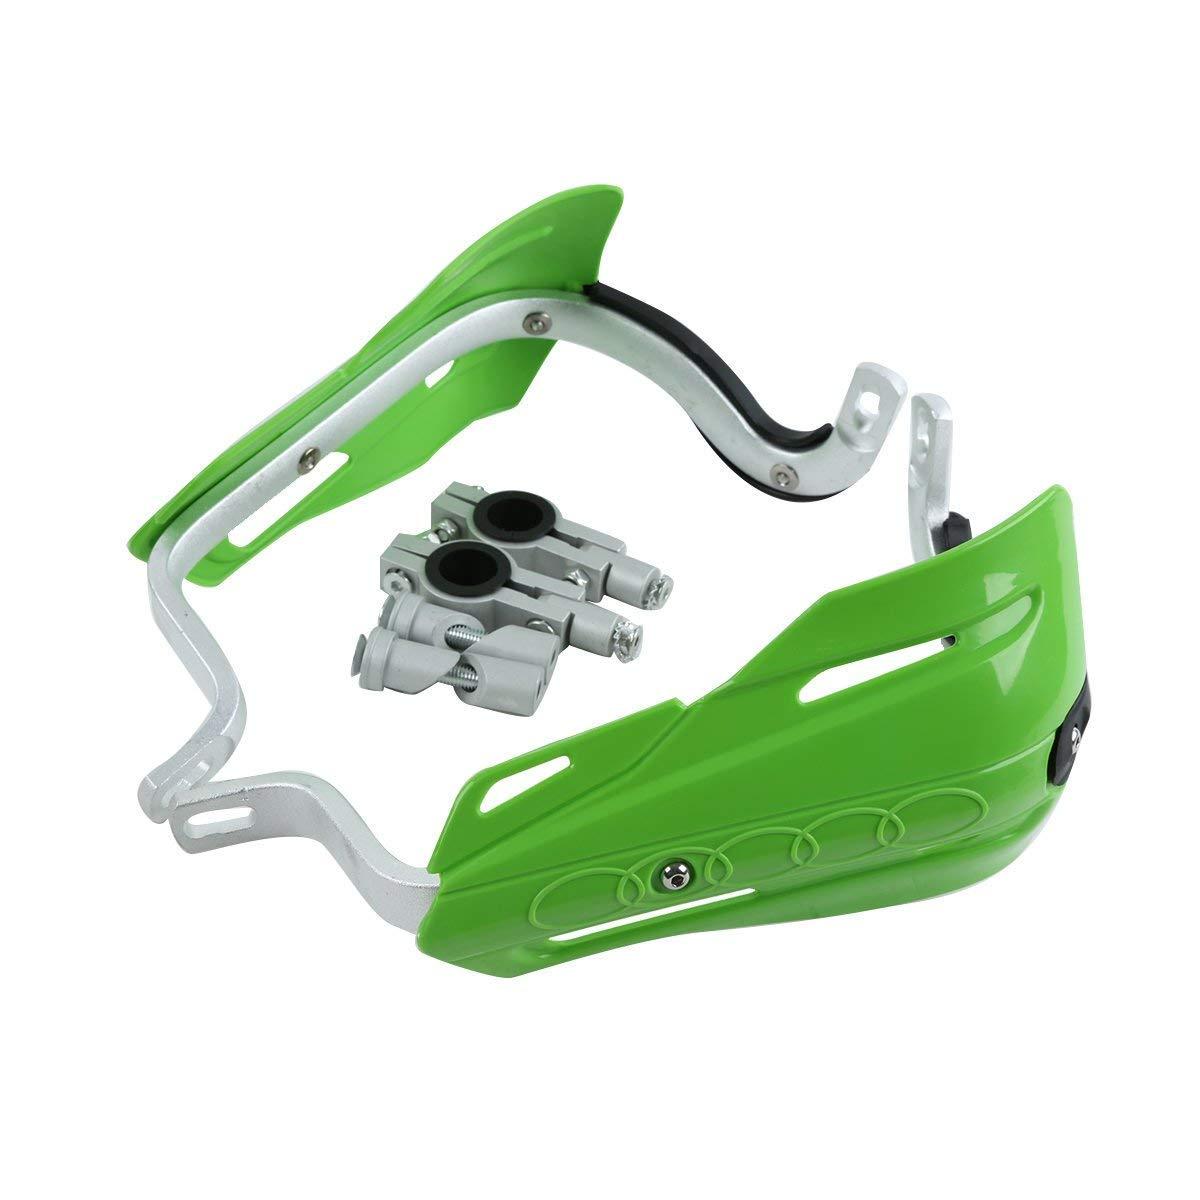 TCMT Green 7//8 22mm Handlebar Hand Brush Guard Handguards For Kawasaki KLR650 KLX110 KLX250 KX450F